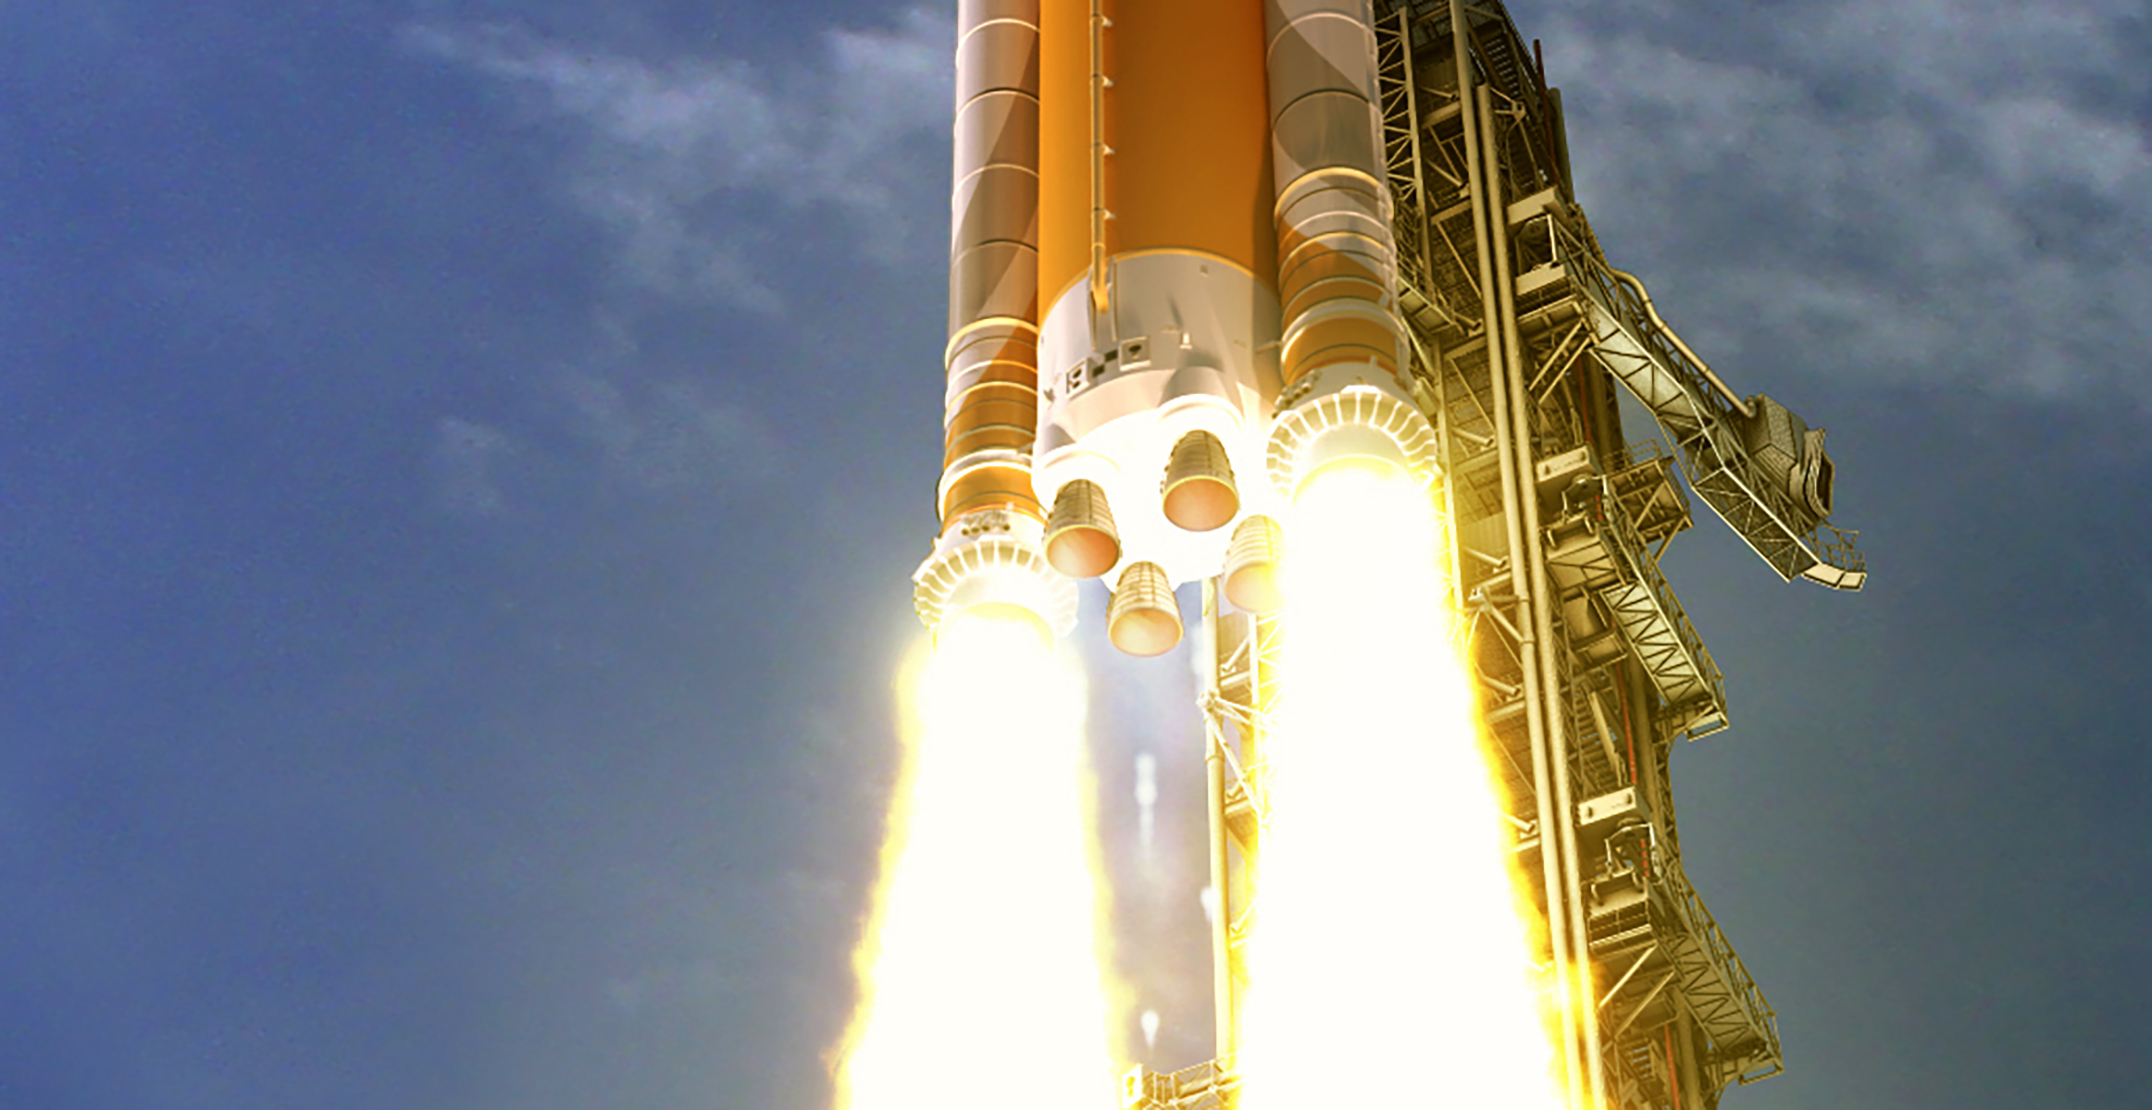 sls-70mt-dac3-orange-launch-rs25_0.jpg